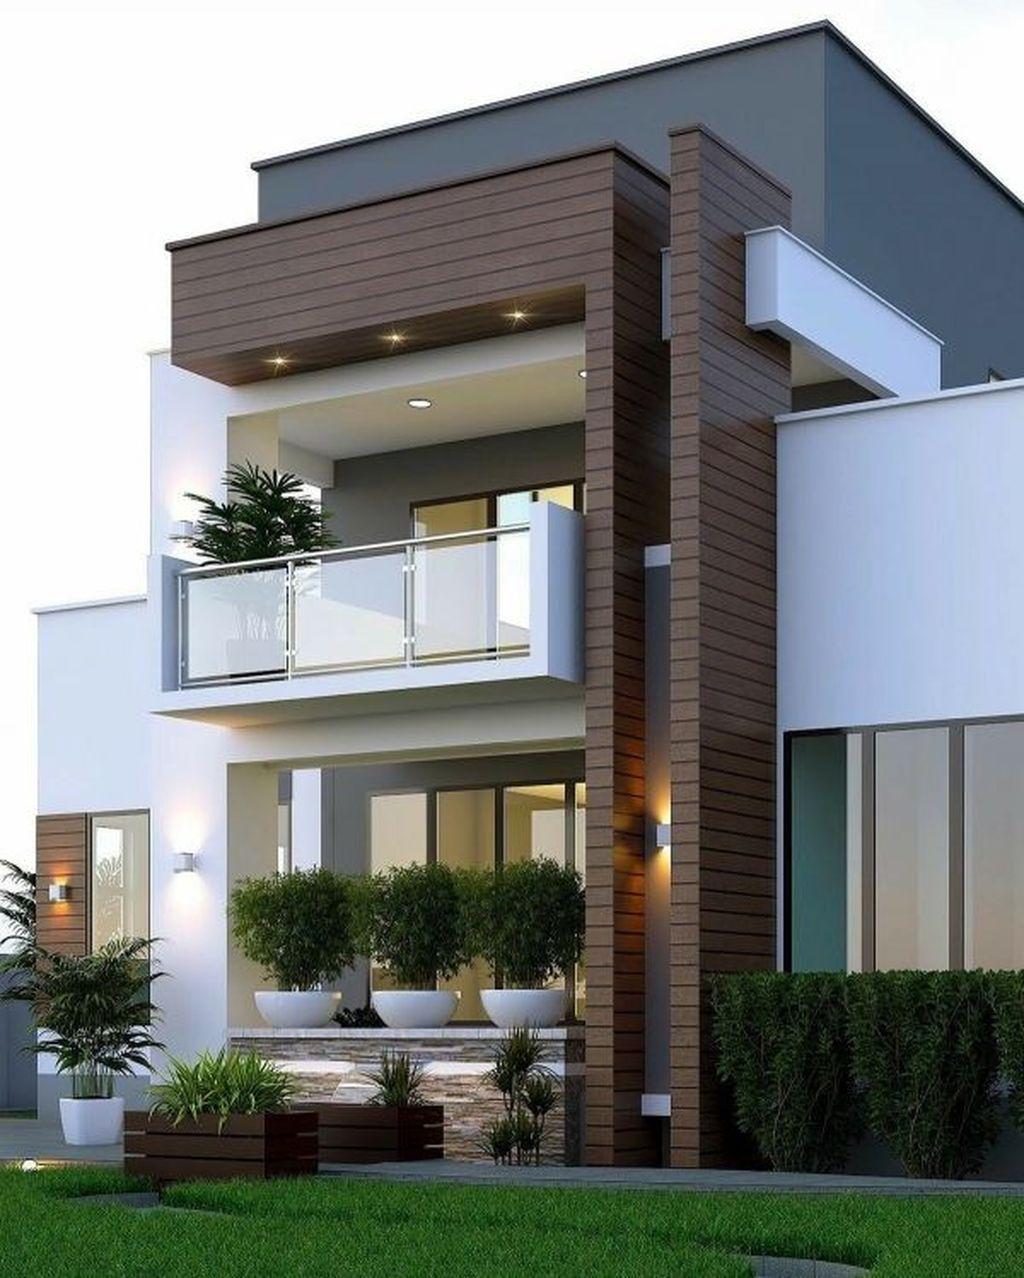 30 Stunning Minimalist Houses Design Ideas That Simple Unique And Modern Modern Minimalist House Small House Design Duplex House Design